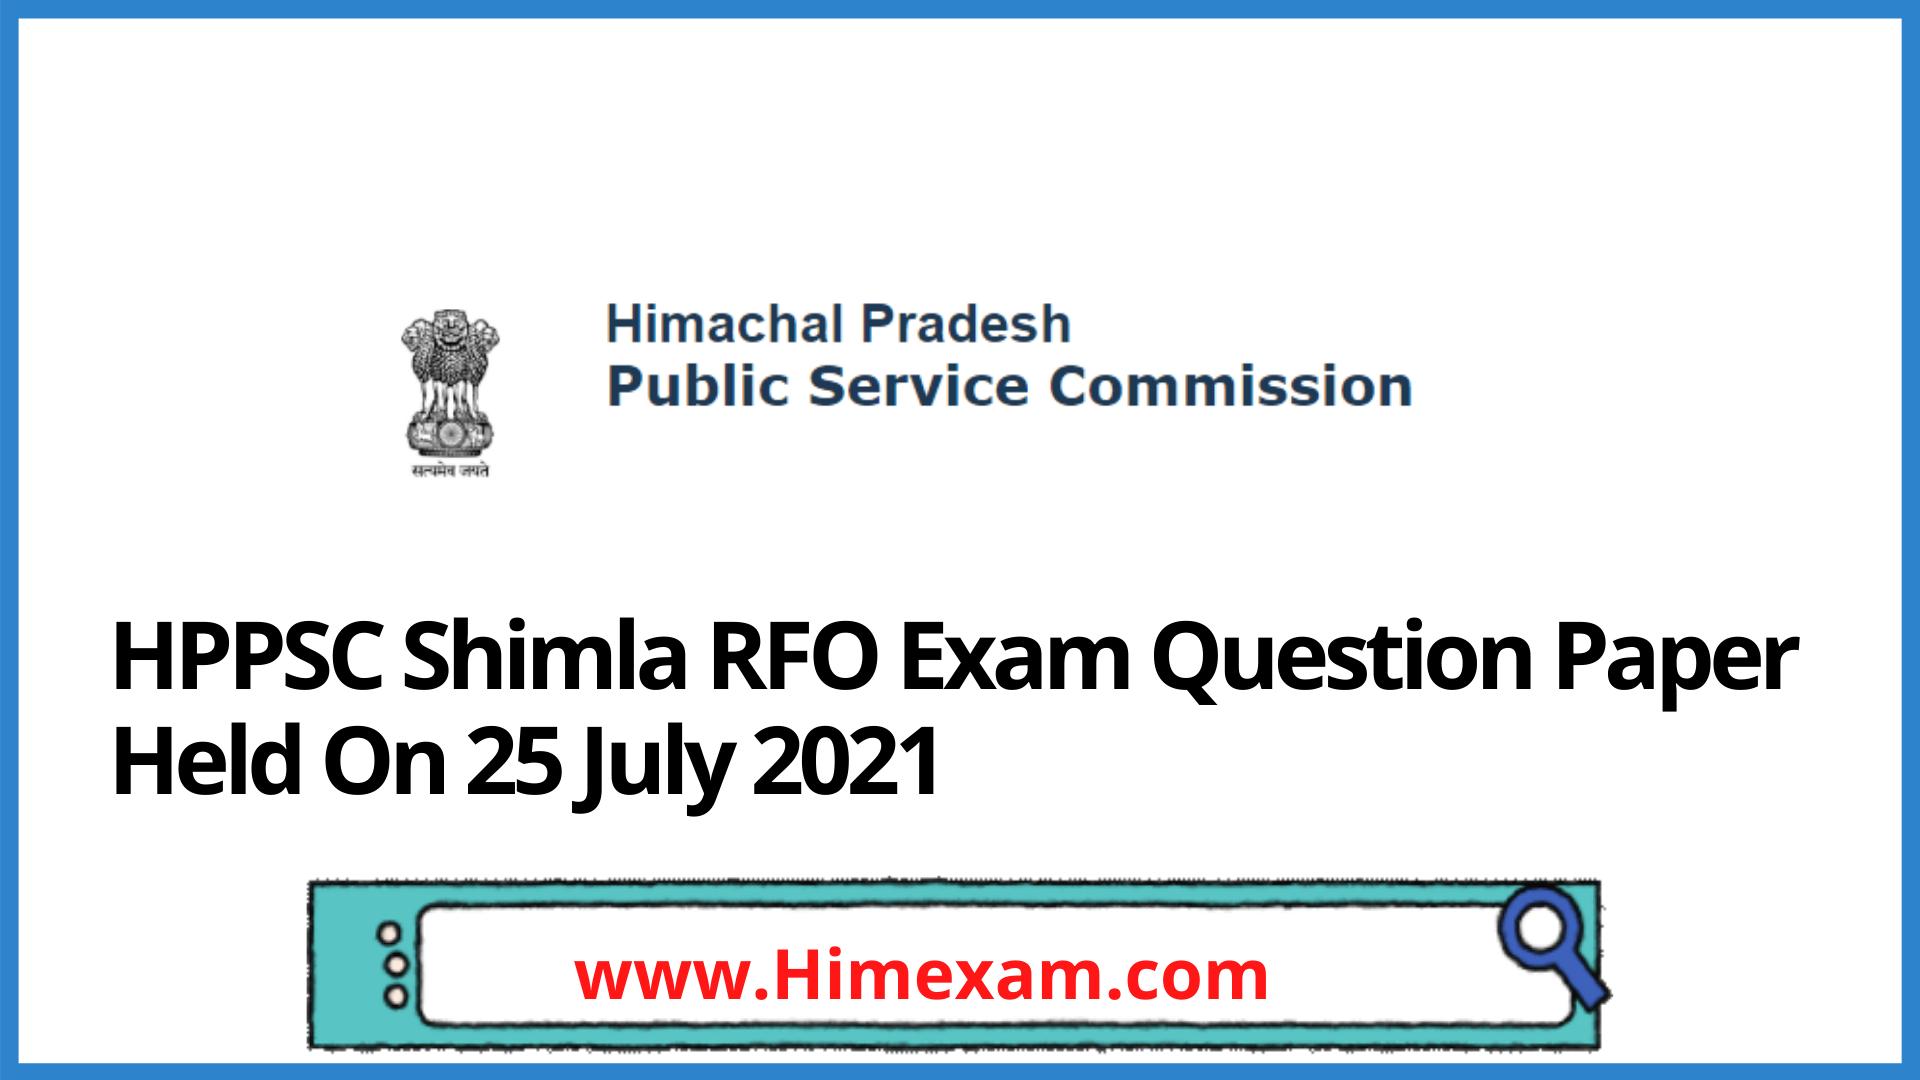 HPPSC Shimla RFO Exam Question Paper Held On 25 July 2021